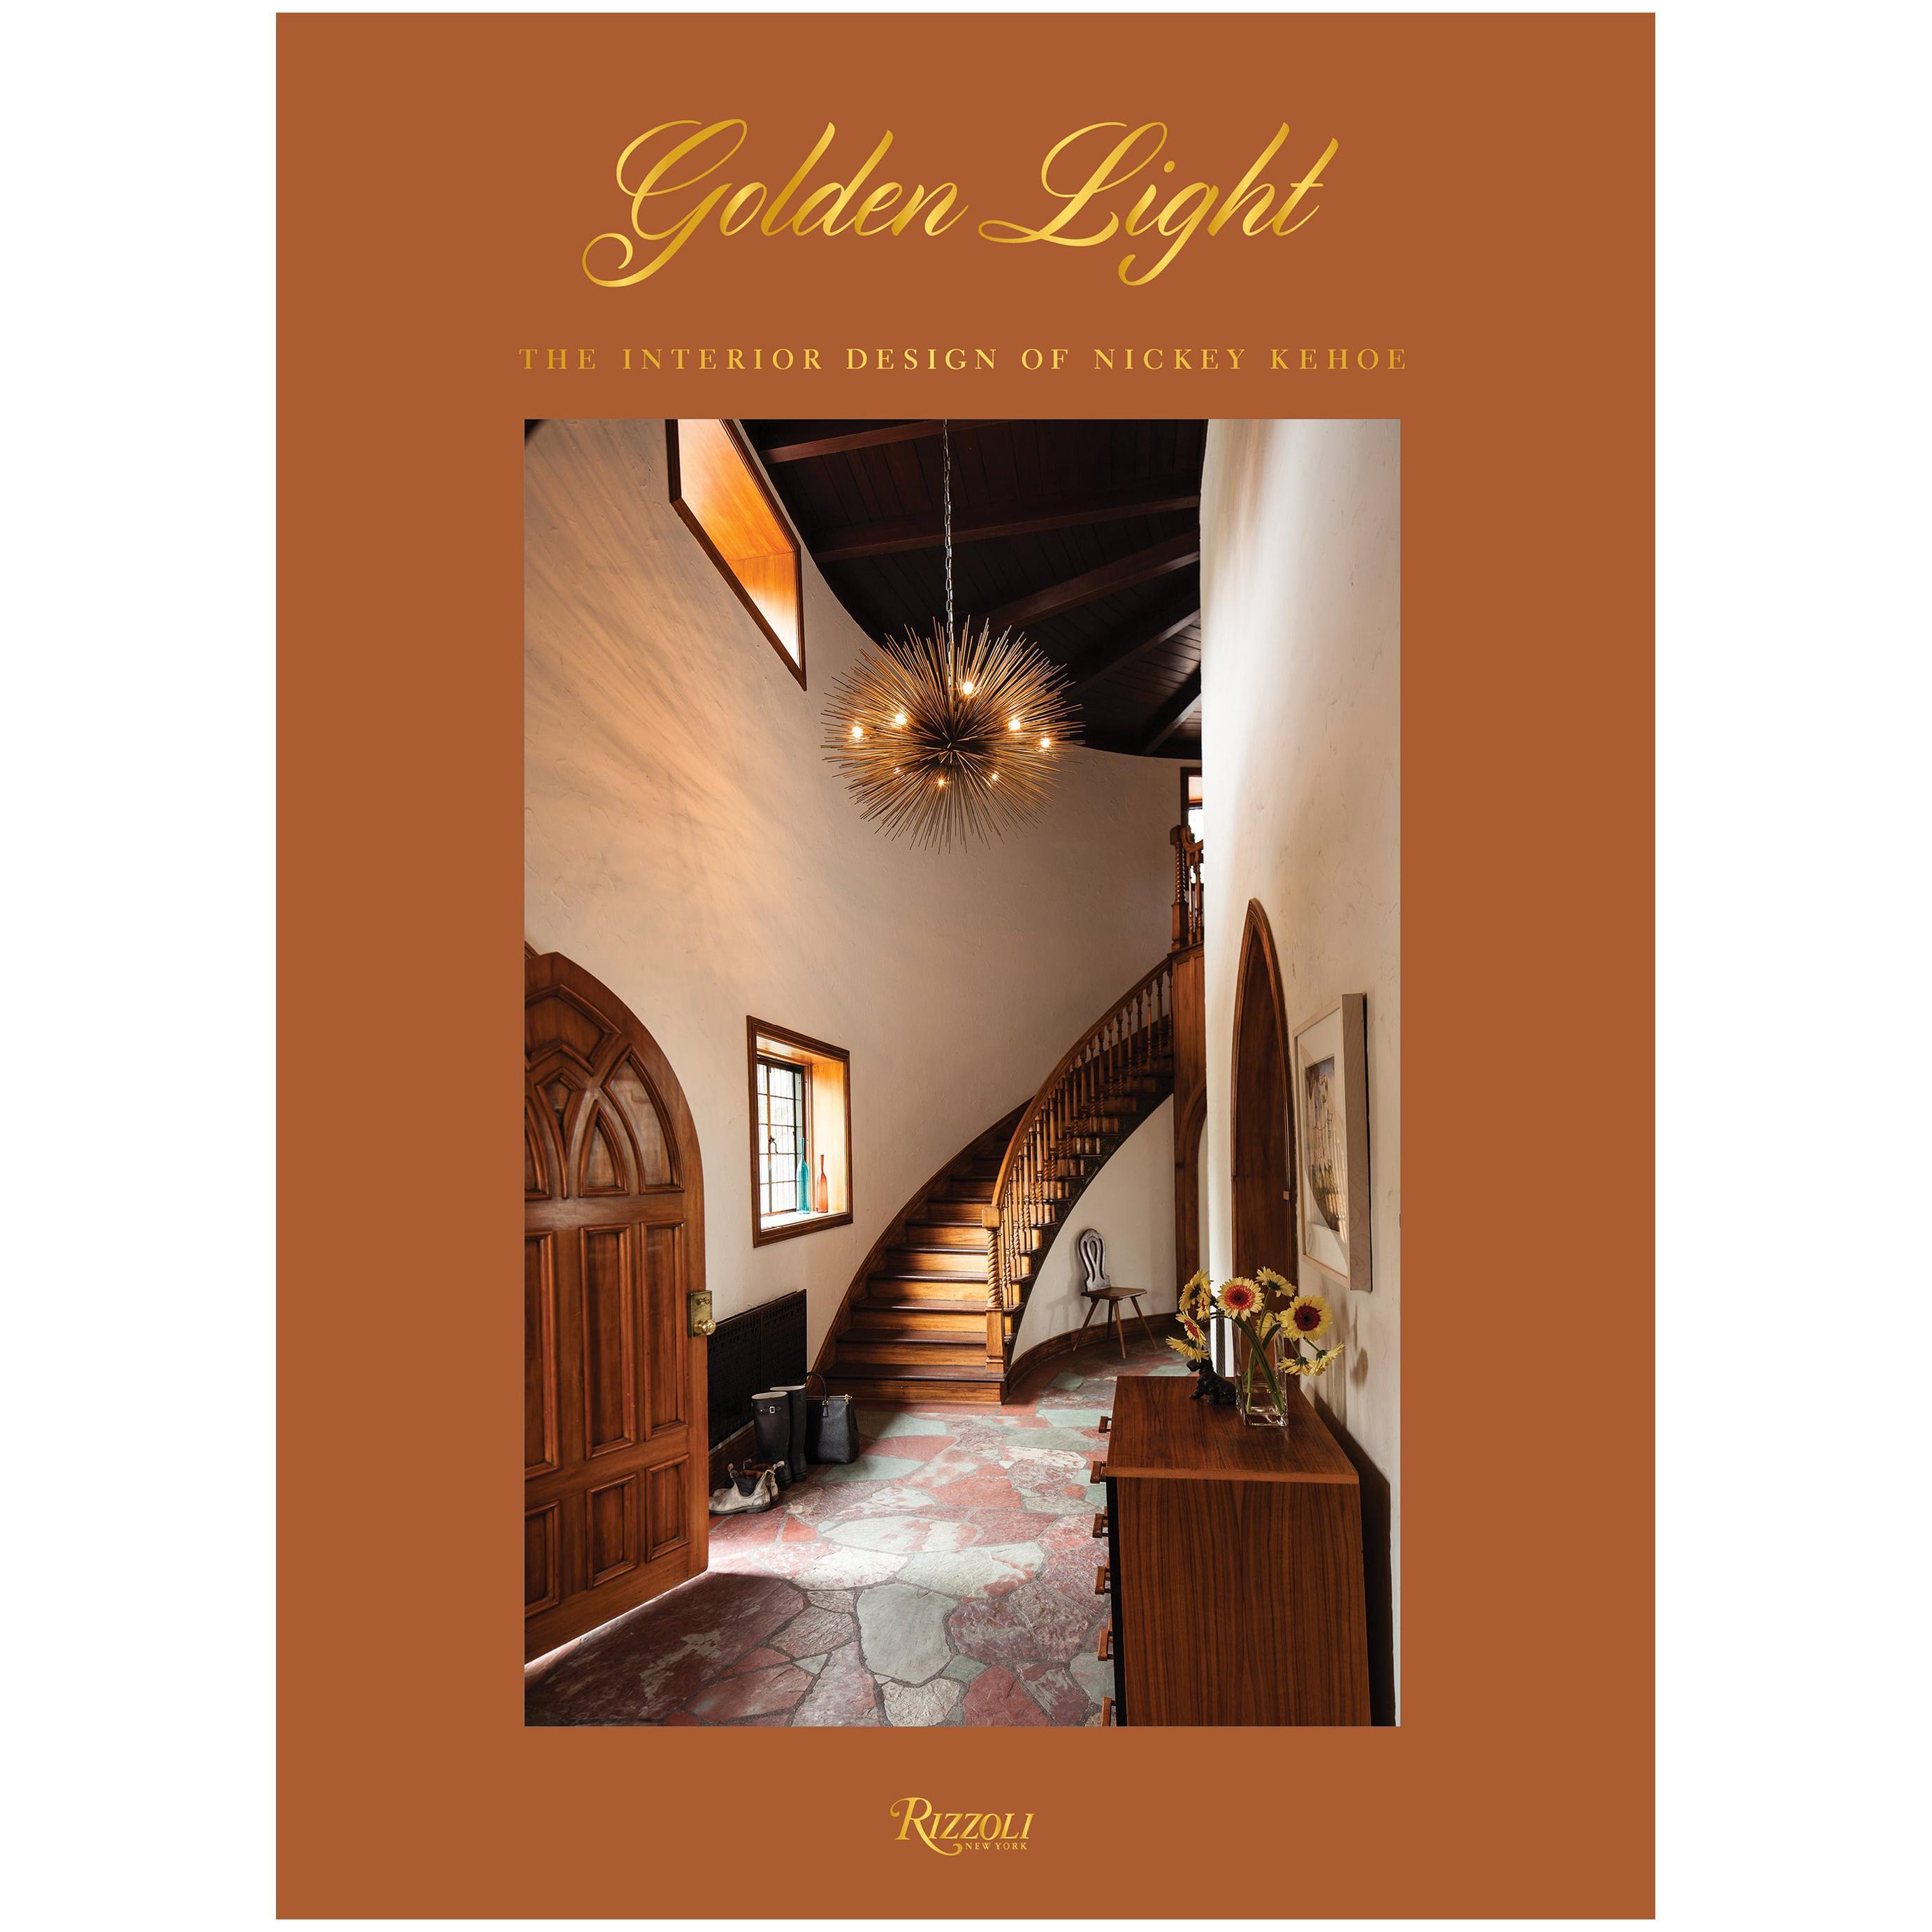 Golden Light the Interior Design of Nickey Kehoe